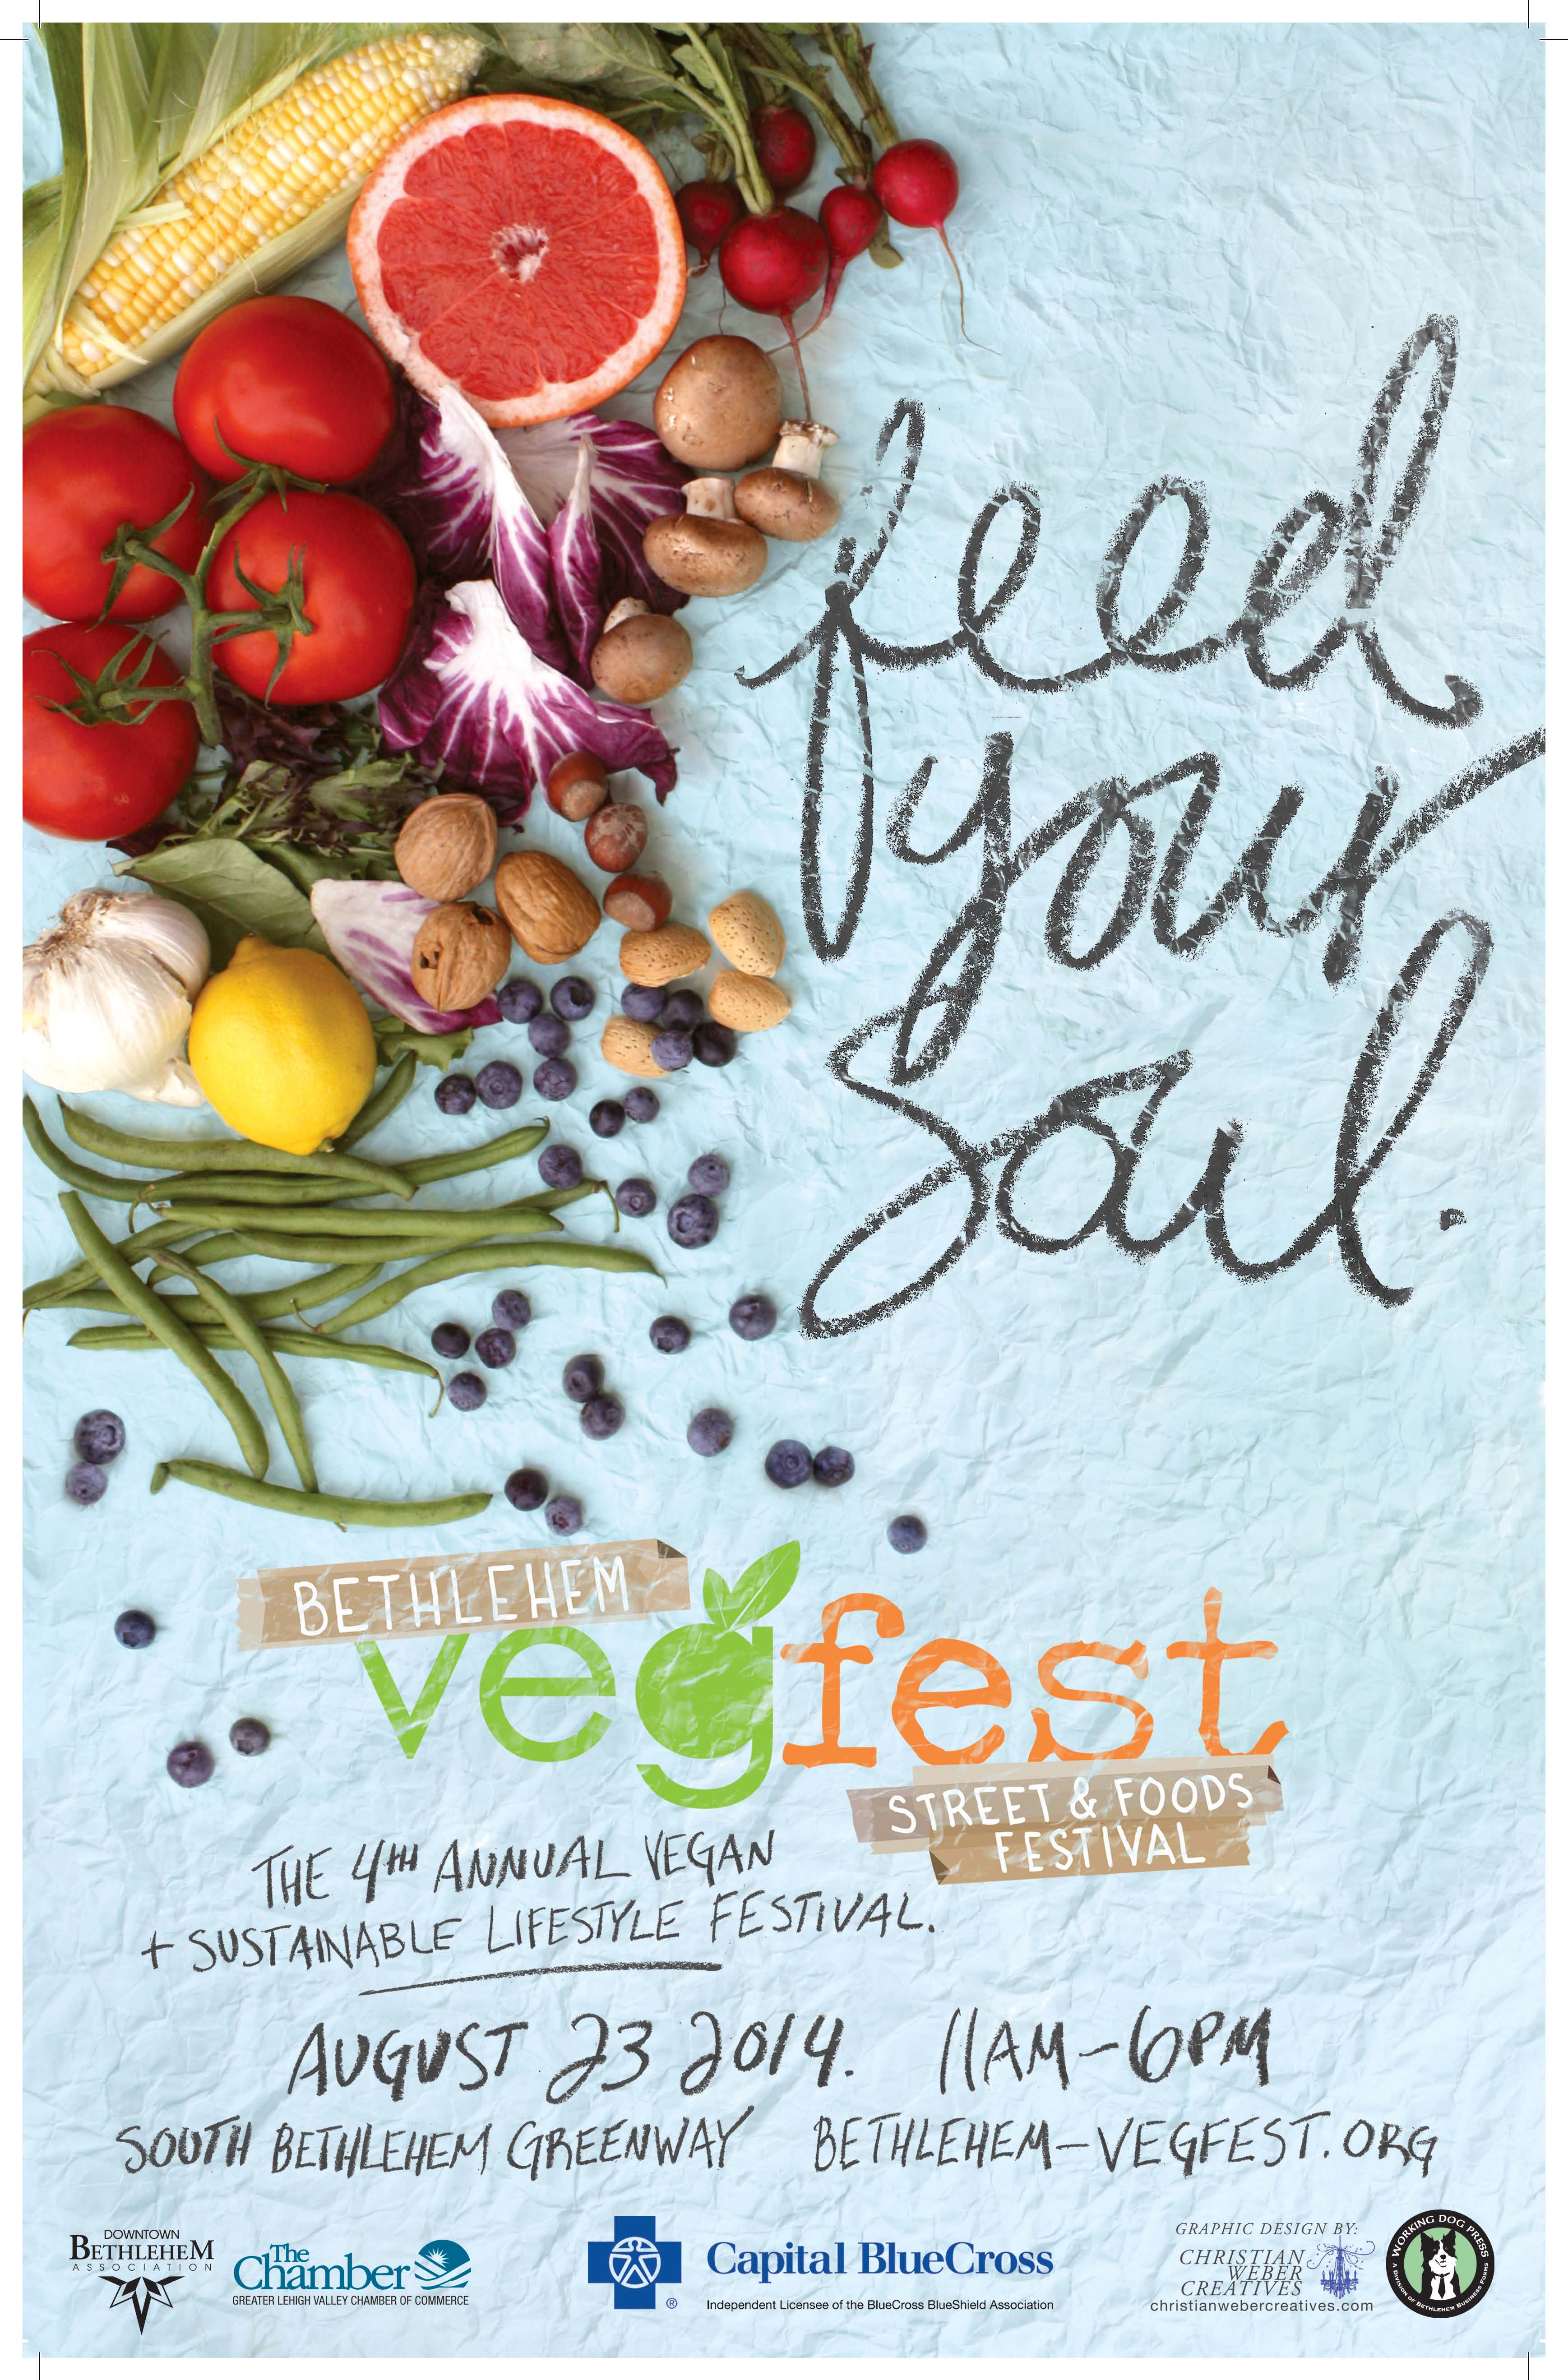 2014 VegFest Poster